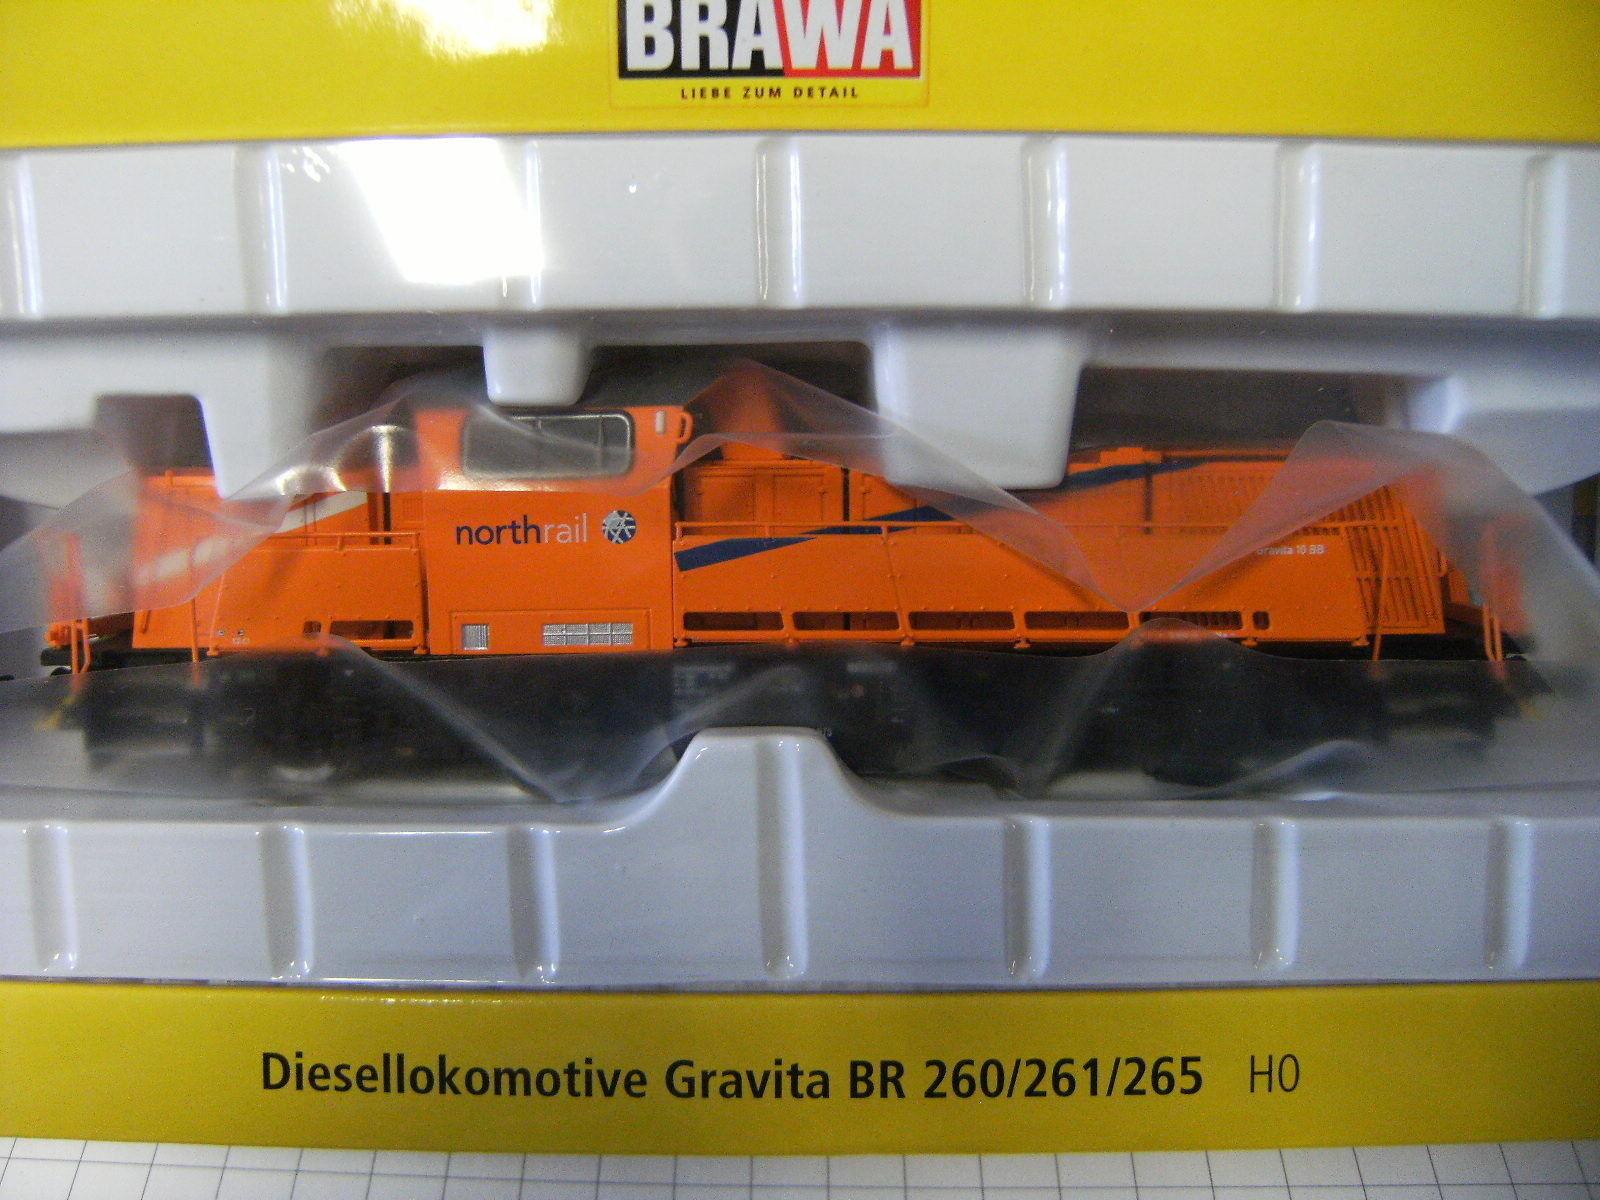 Brawa ho 42763 diesellok gravita 10bb northrail corriente alterna-digital nuevo embalaje original